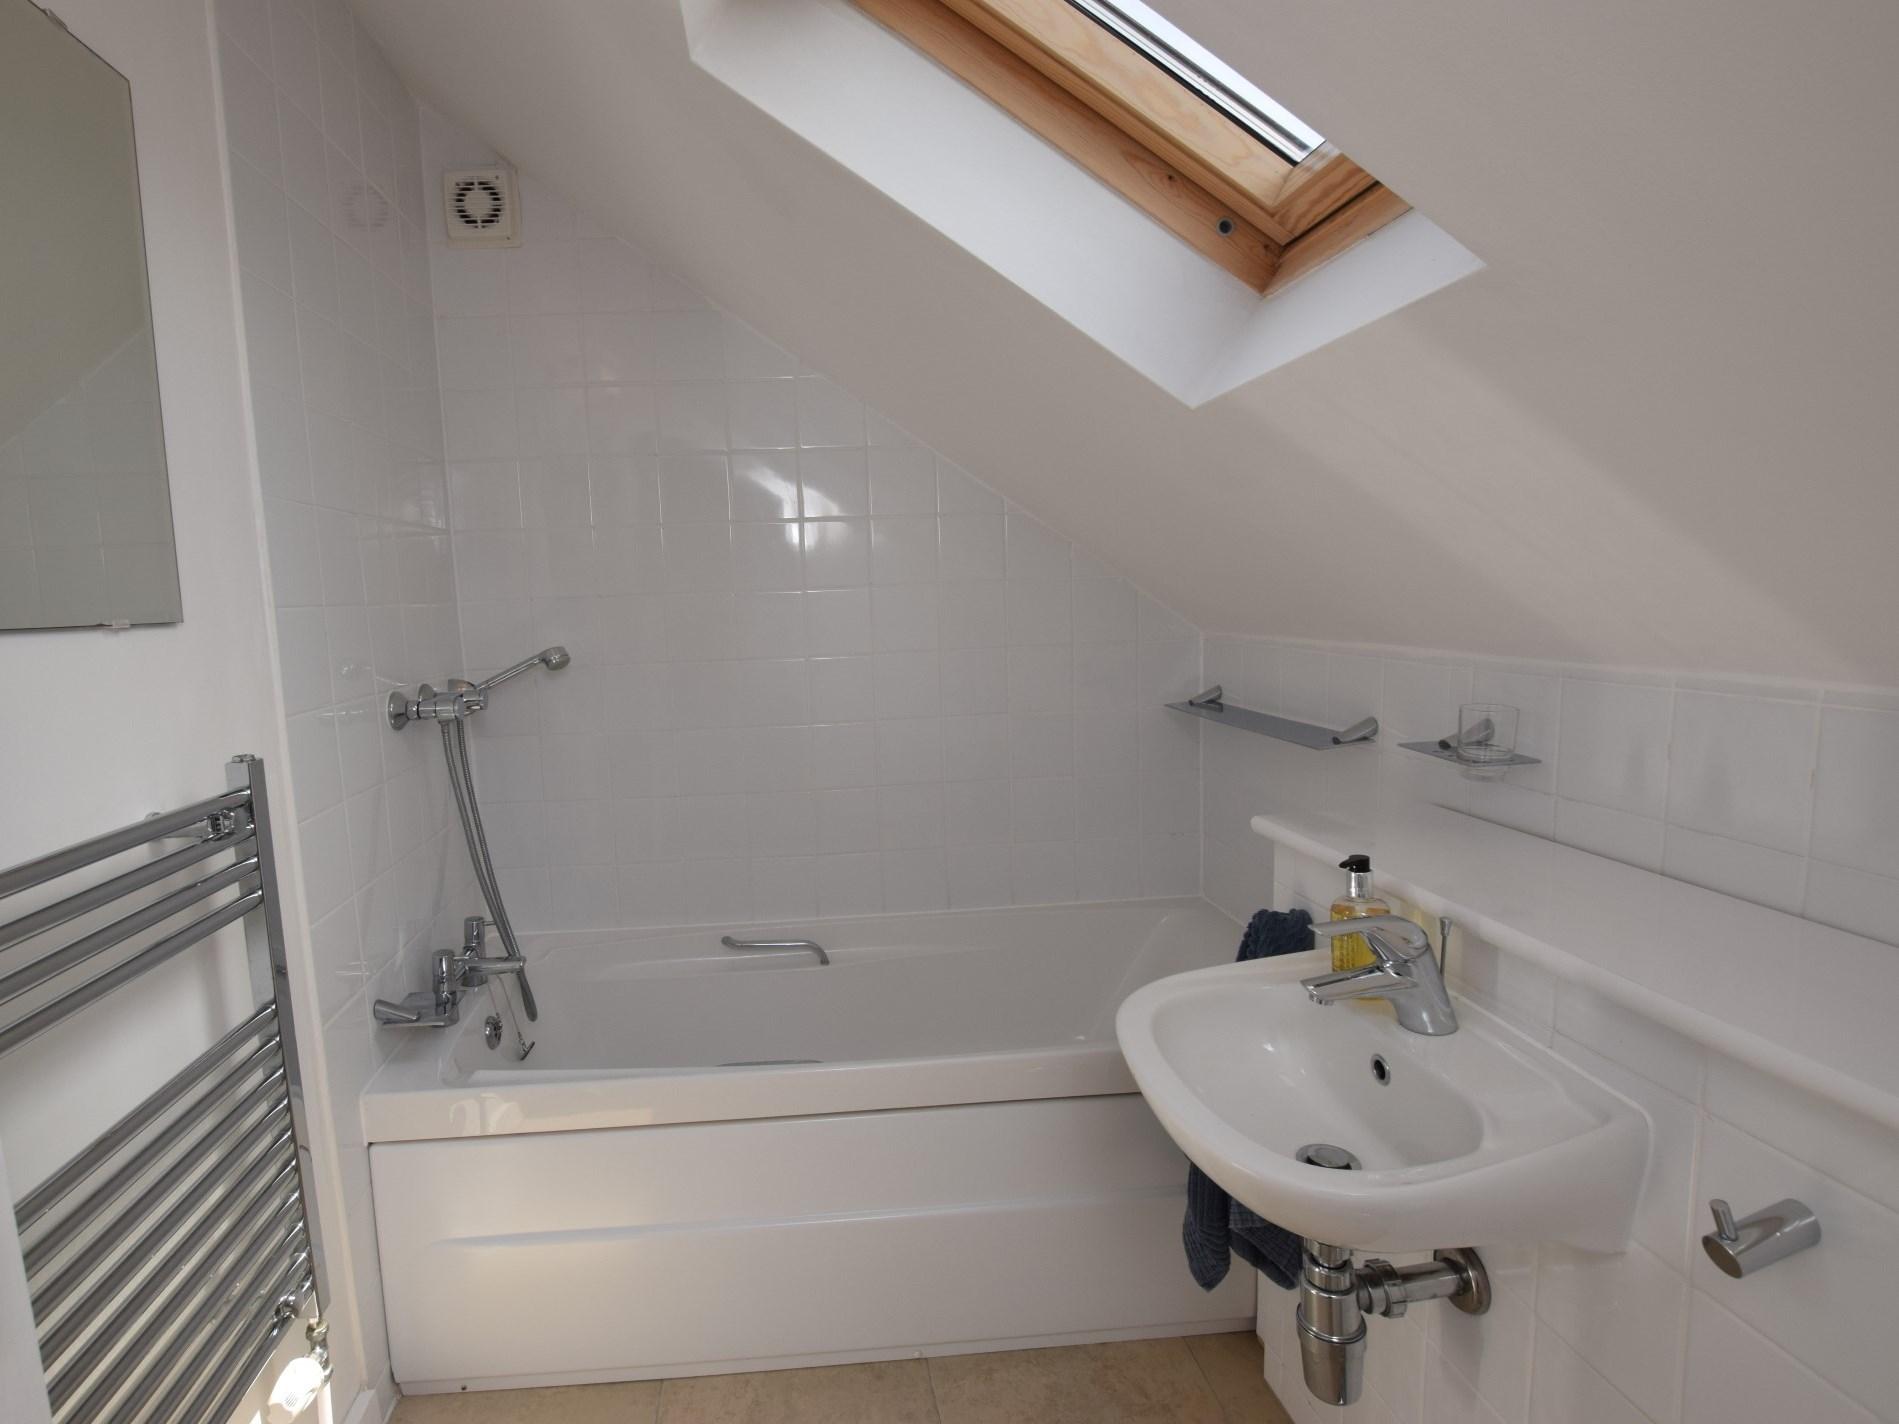 Upstairs bath with hand shower